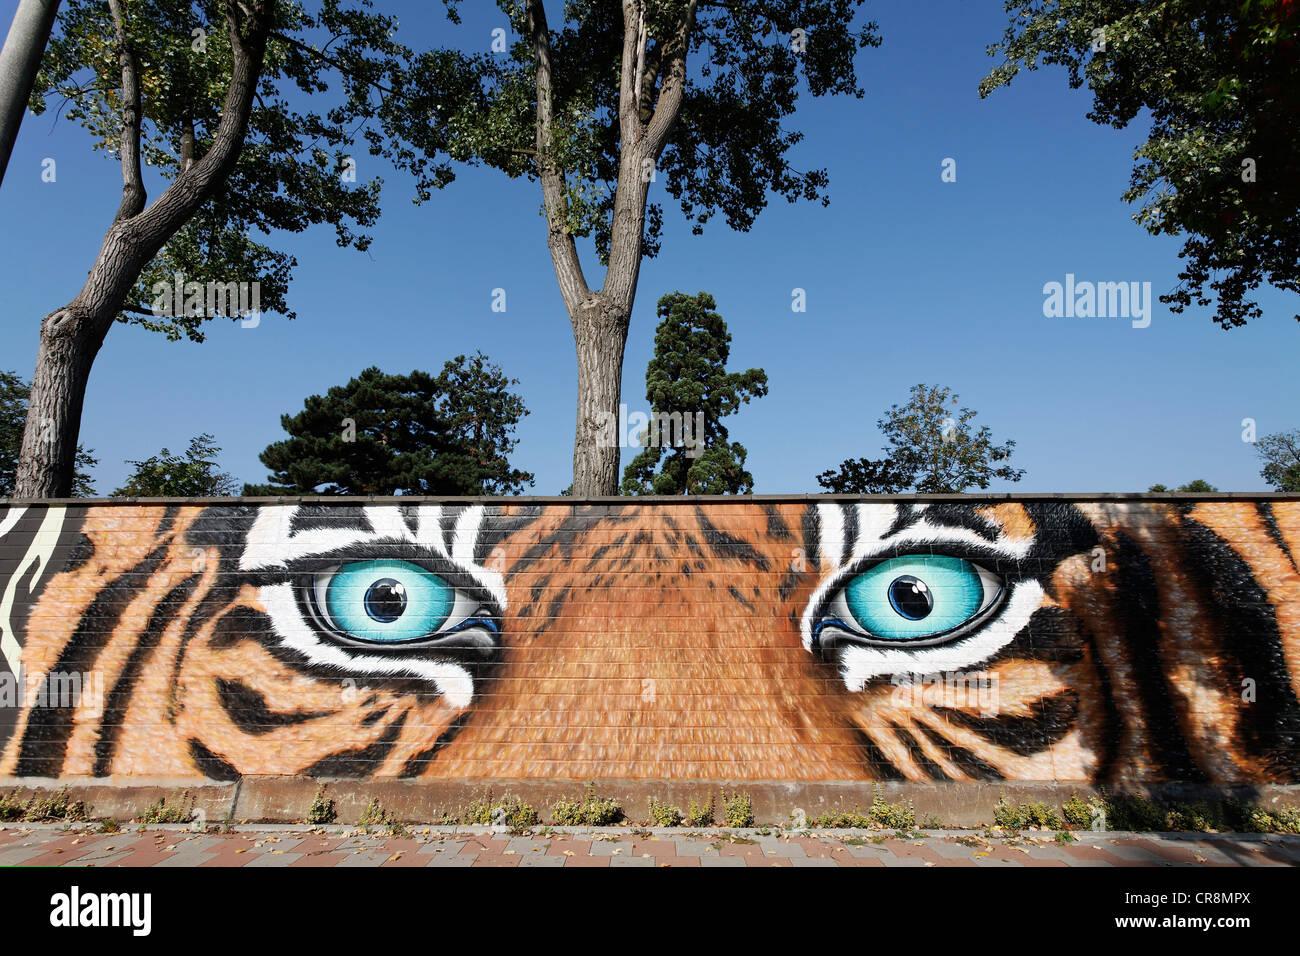 [Изображение: threatening-tiger-eyes-graffiti-on-the-w...CR8MPX.jpg]